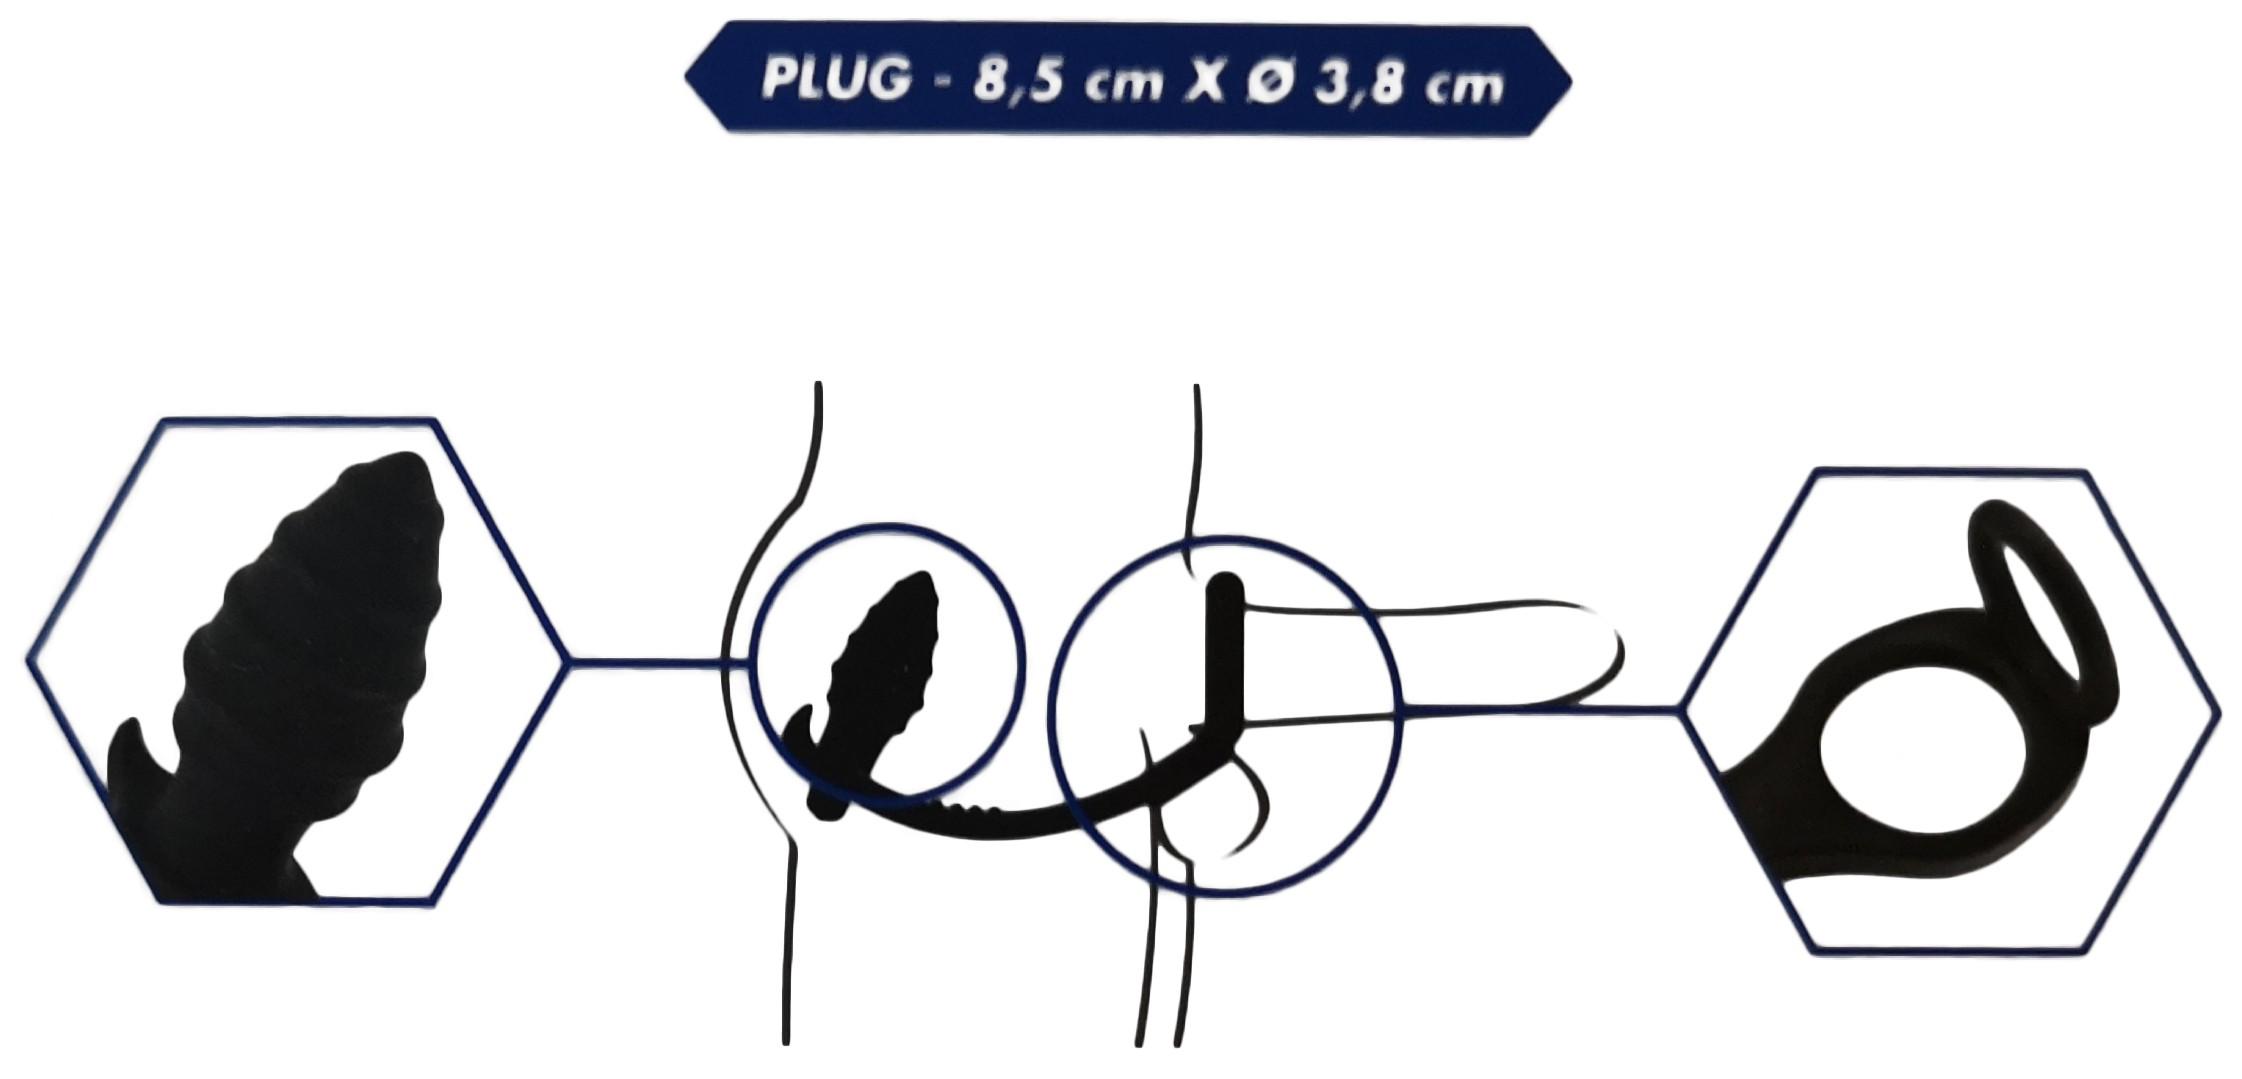 cockring-plug-vibrant-ap071.jpg